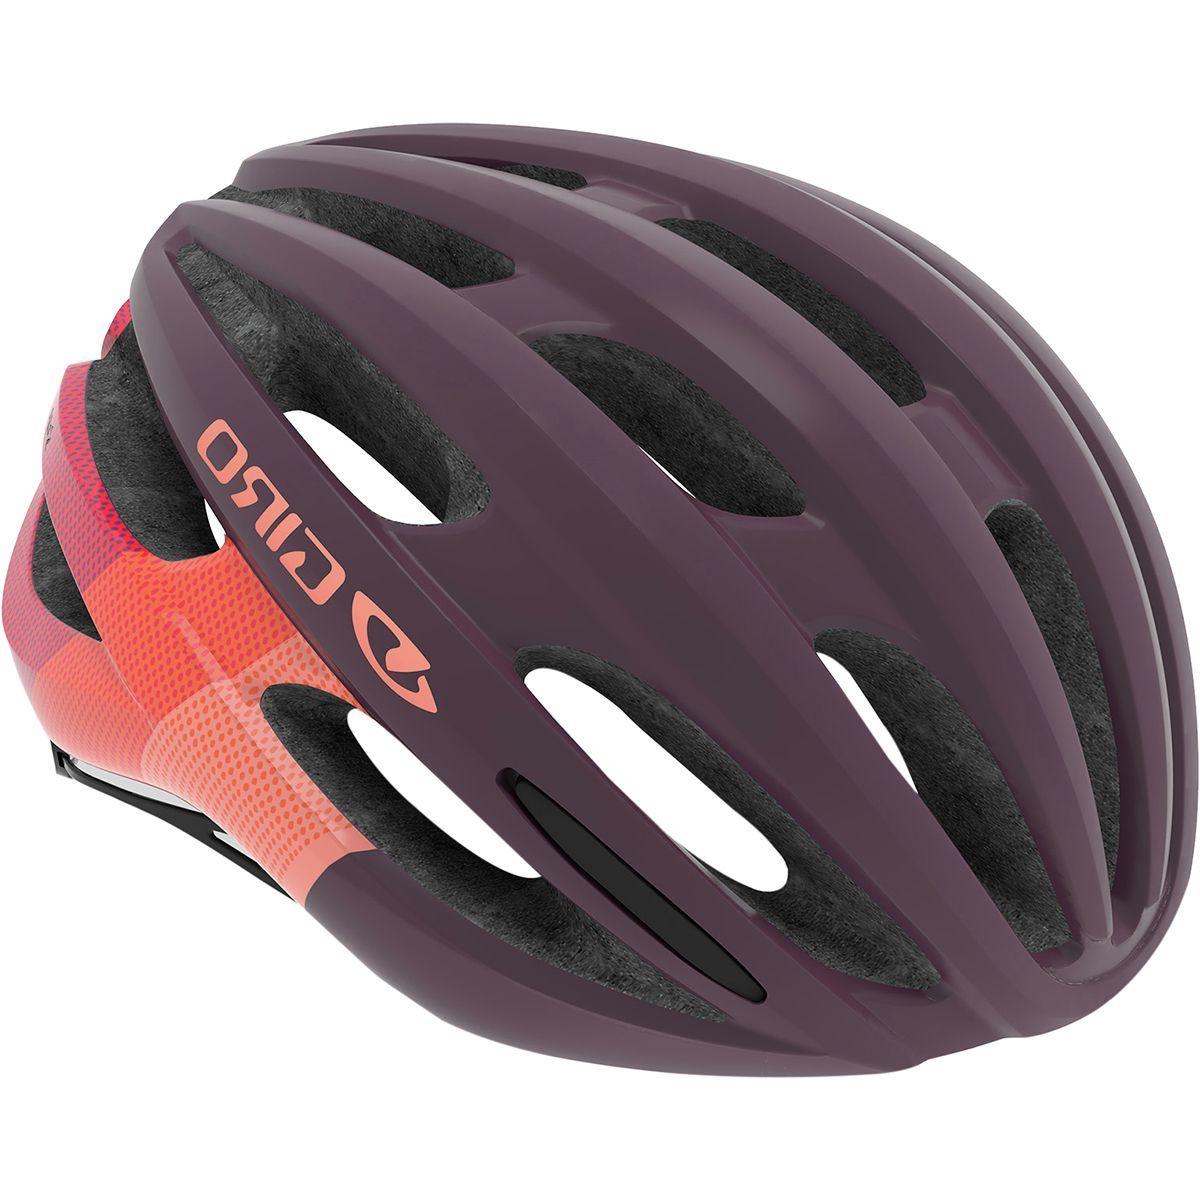 Giro Saga MIPS Helmet - Women's